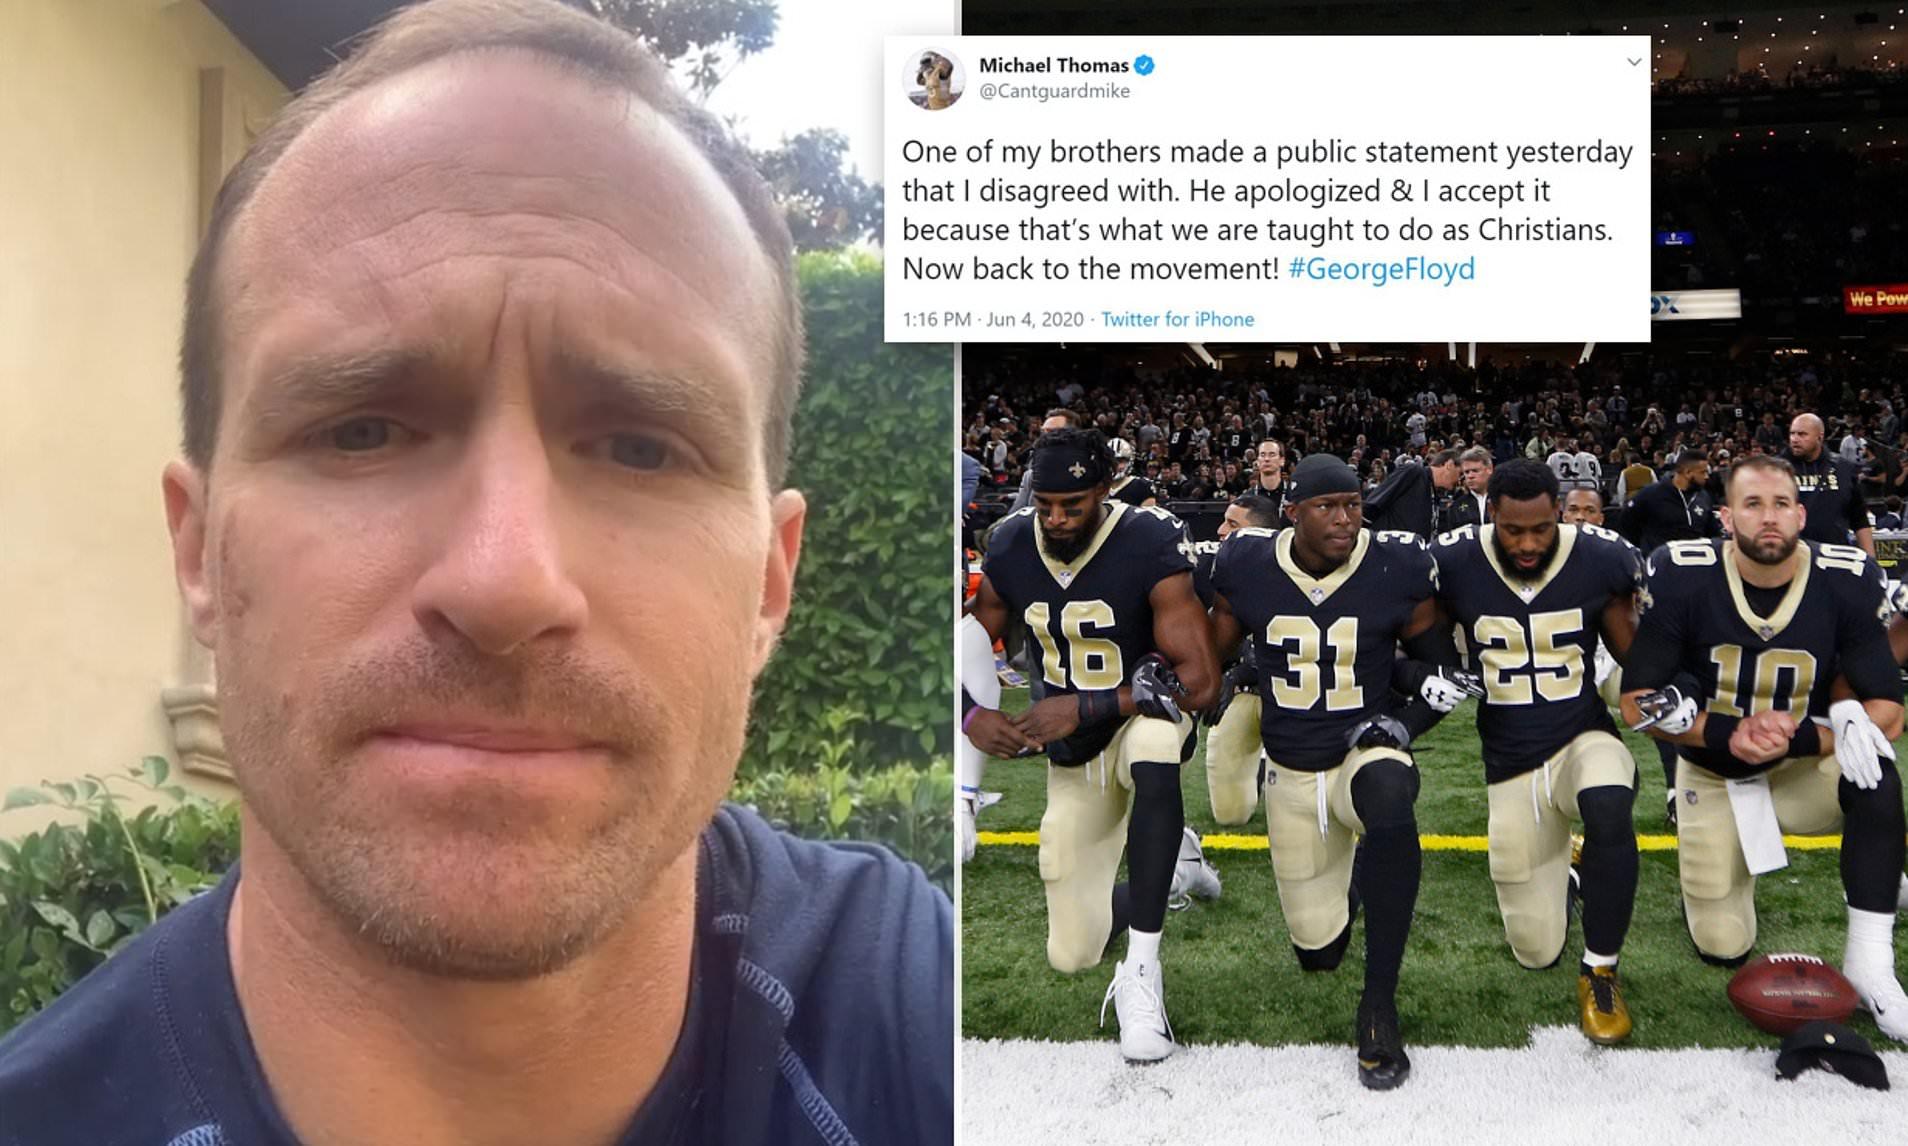 Drew Brees's statements regarding Black Lives Matter